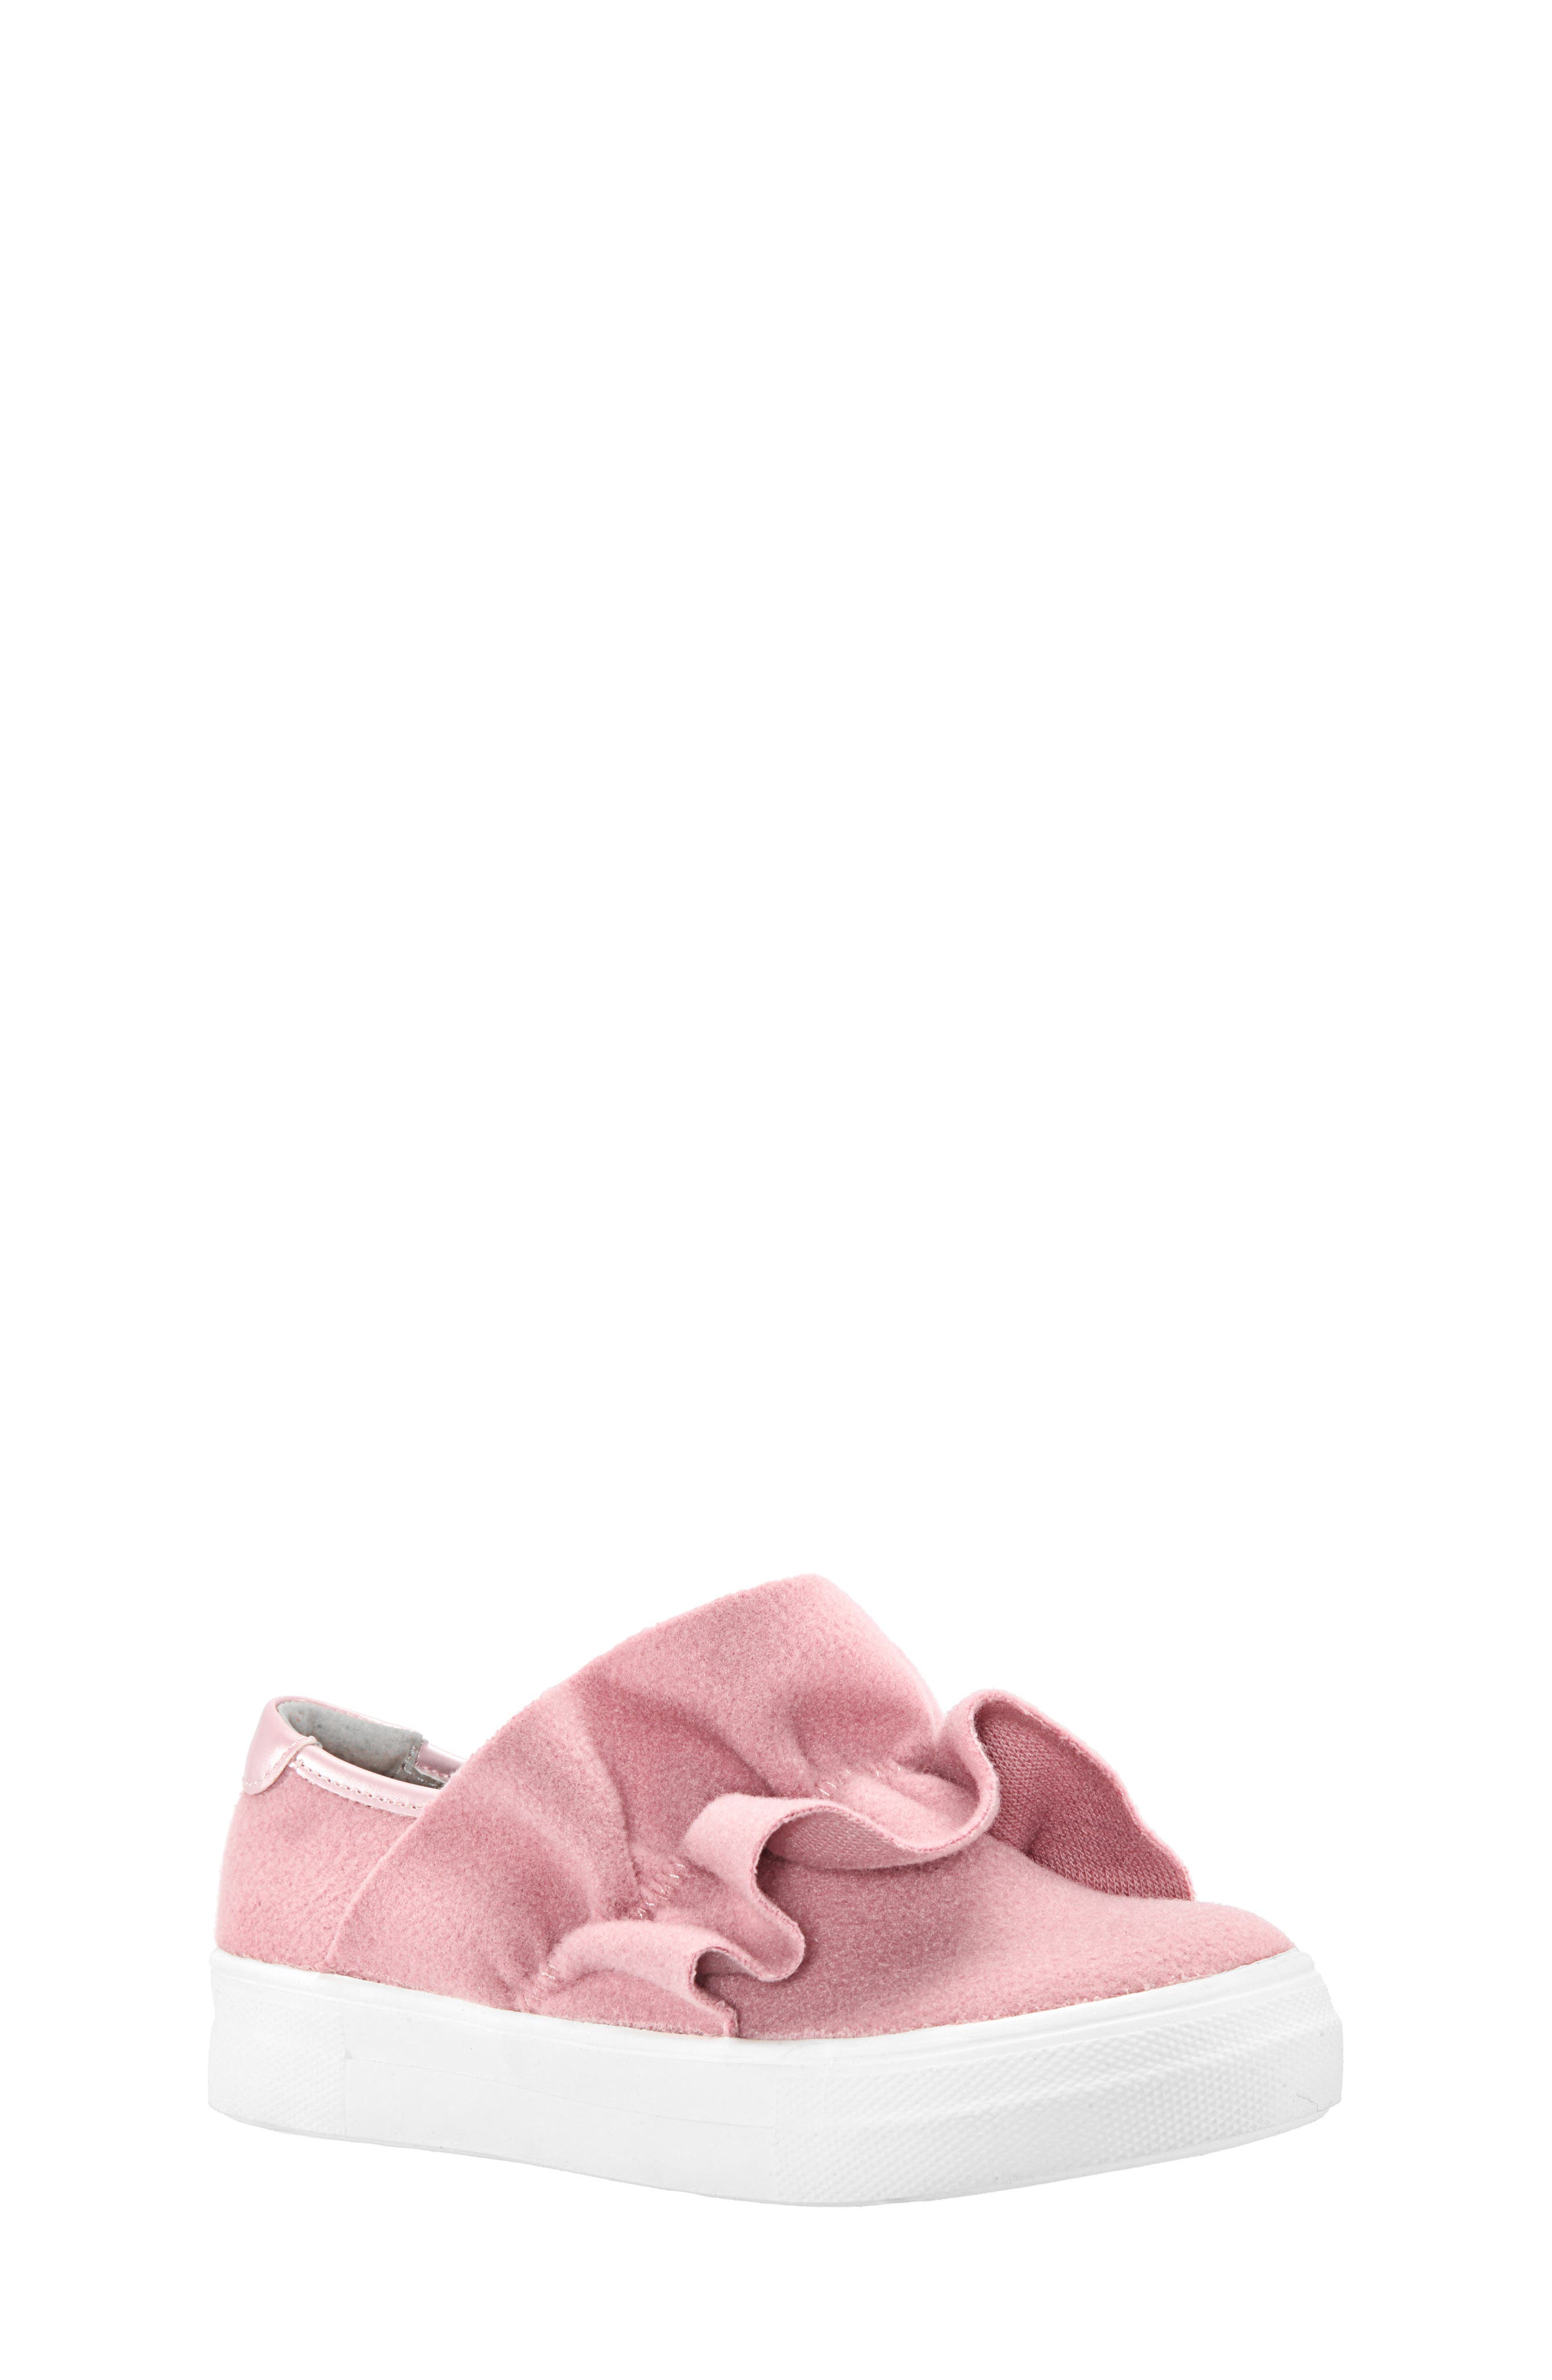 Ivani Slip-On Sneaker,                             Main thumbnail 1, color,                             Blush Flannel